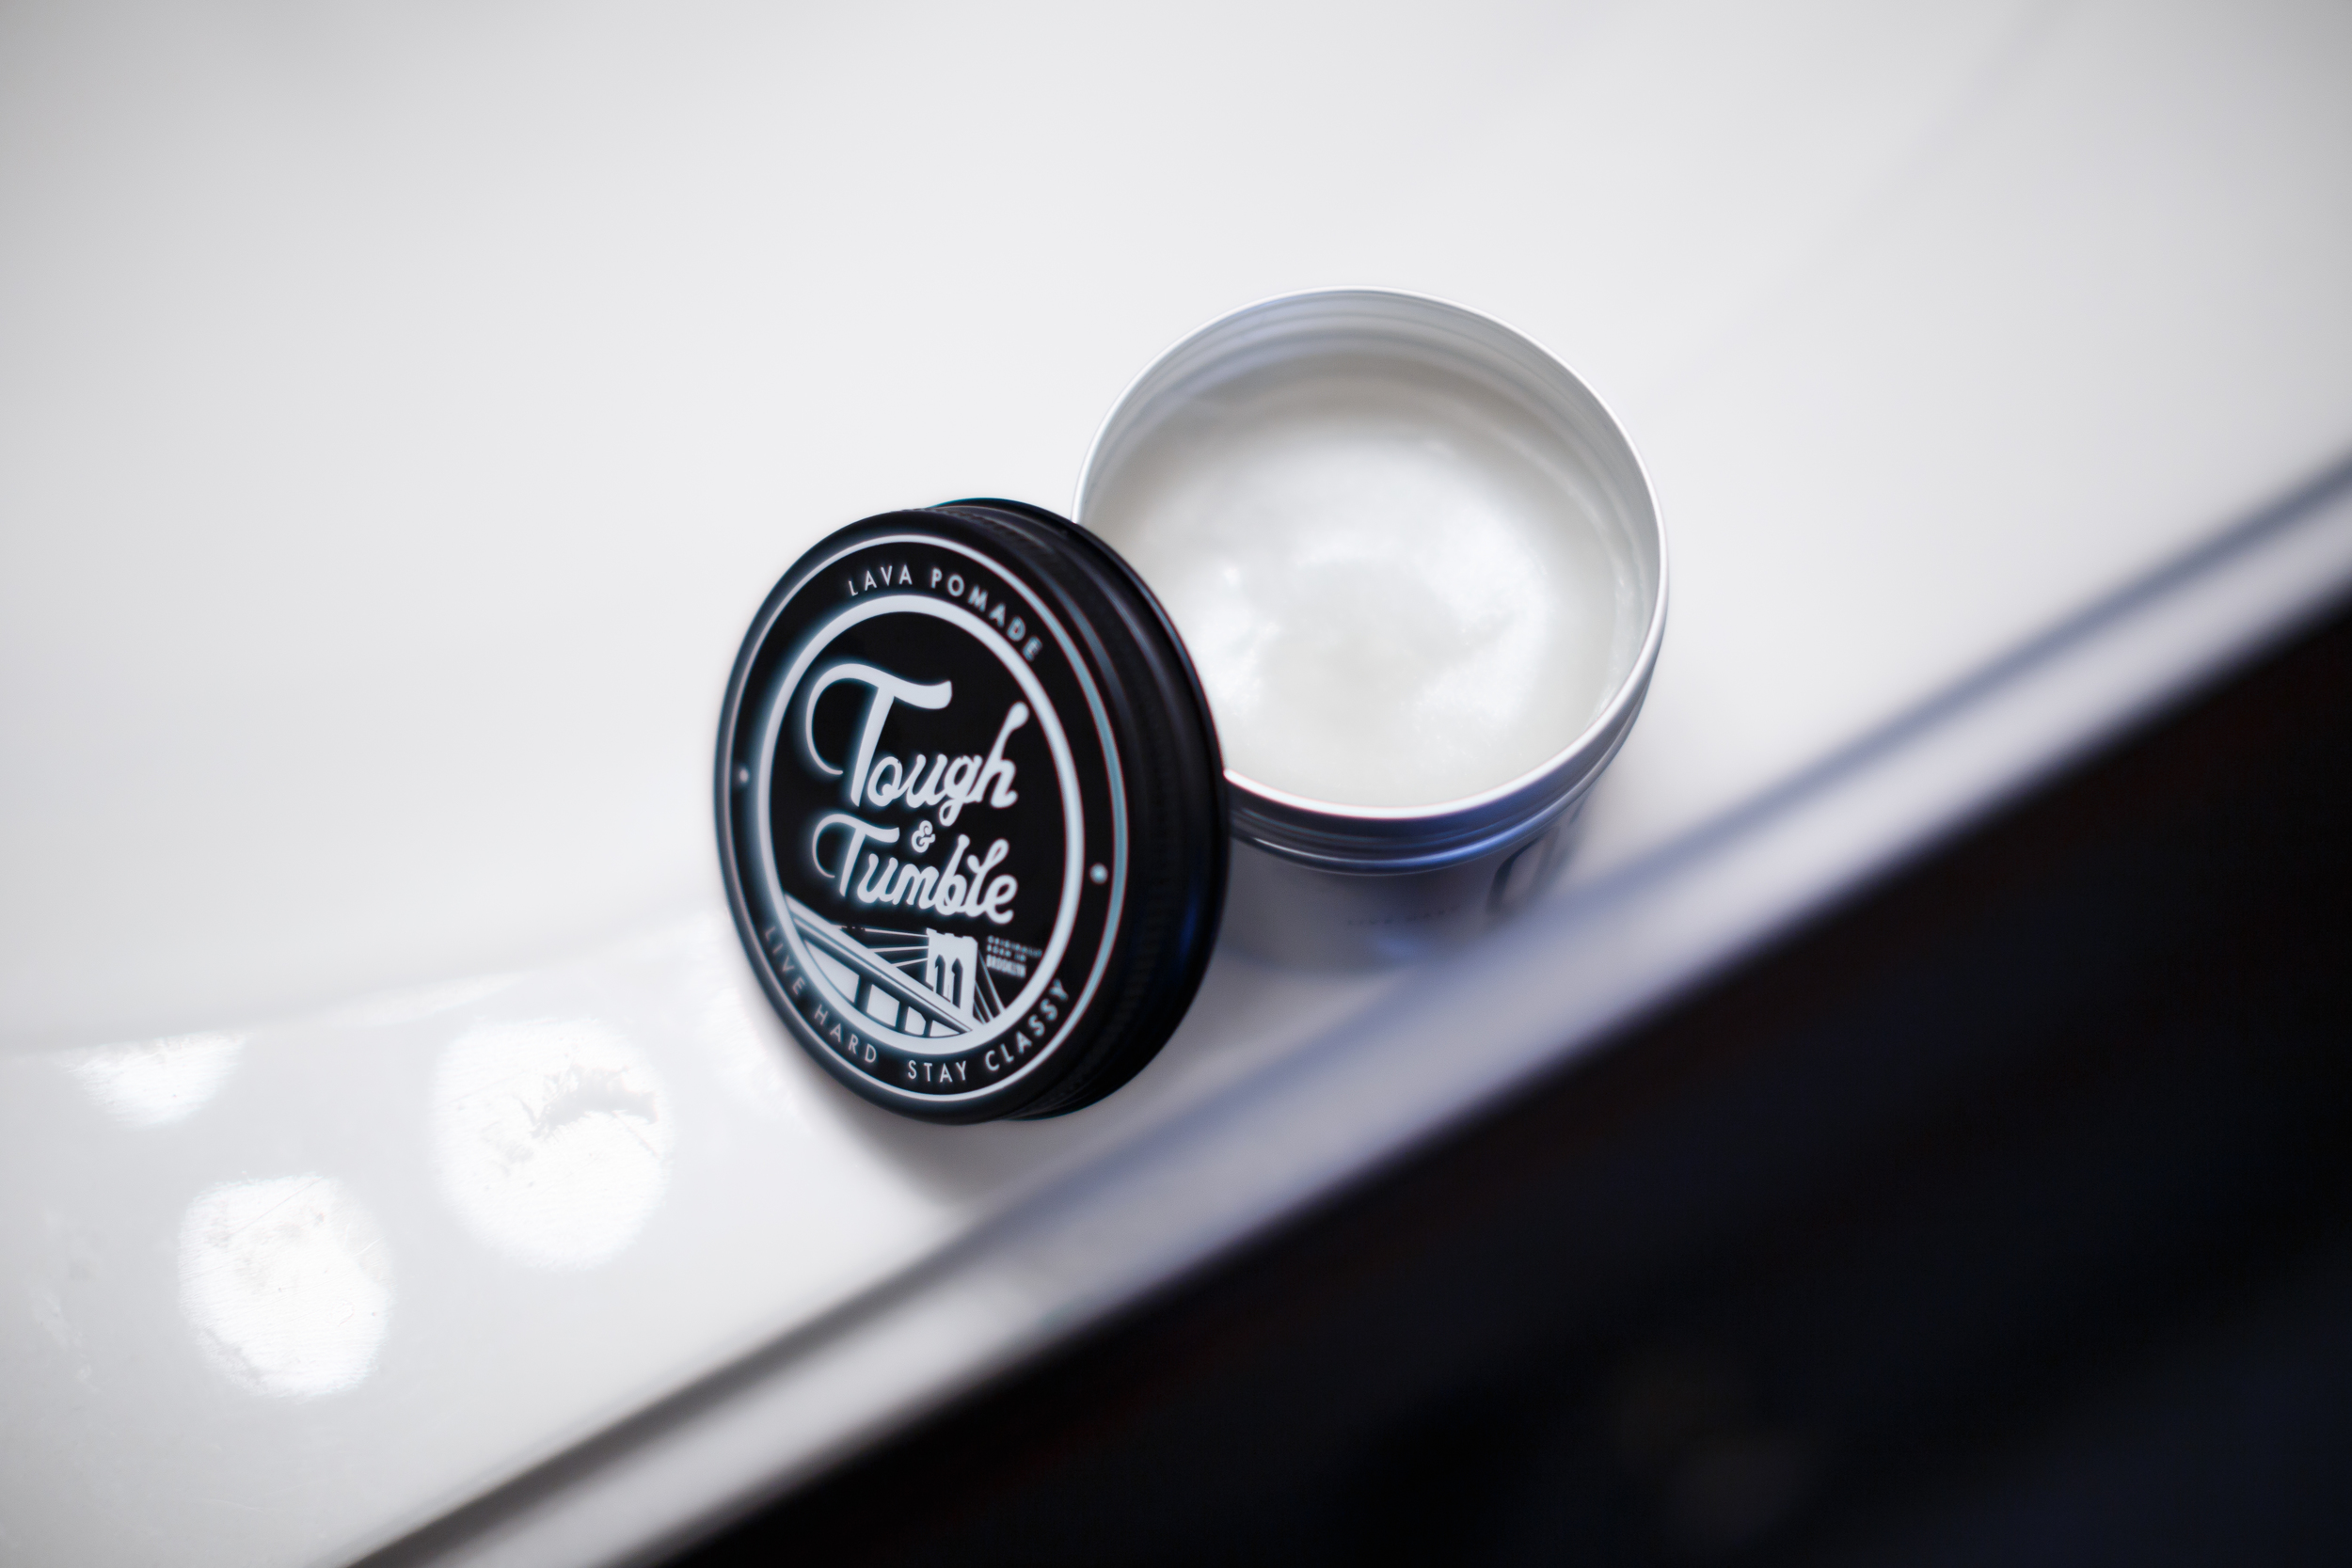 Tough & Tumble No.2 Solid & Shine Lava Pomade ThePomp Pomp Pompadour Product Review